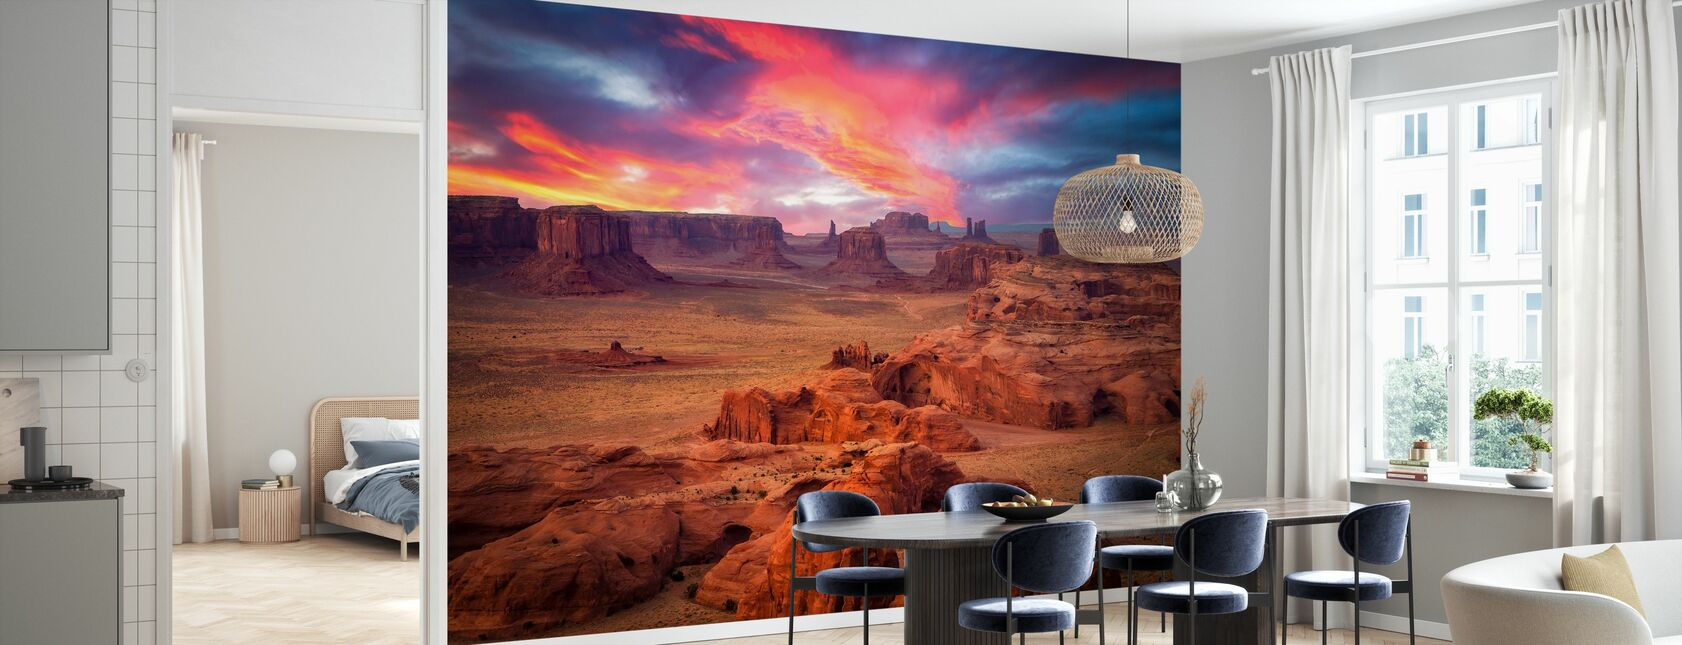 Hunts Mesa - Wallpaper - Kitchen